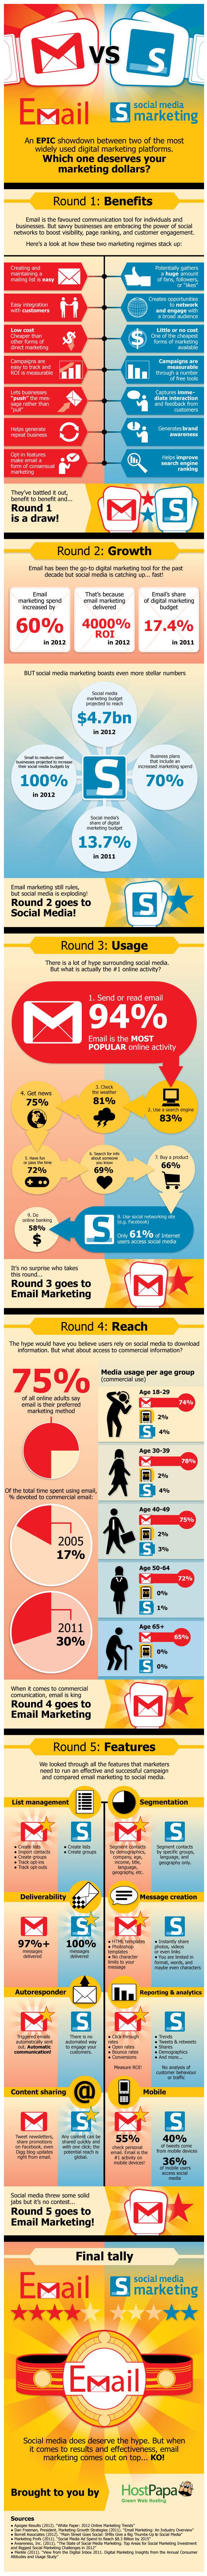 Email vs Marketing en redes sociales